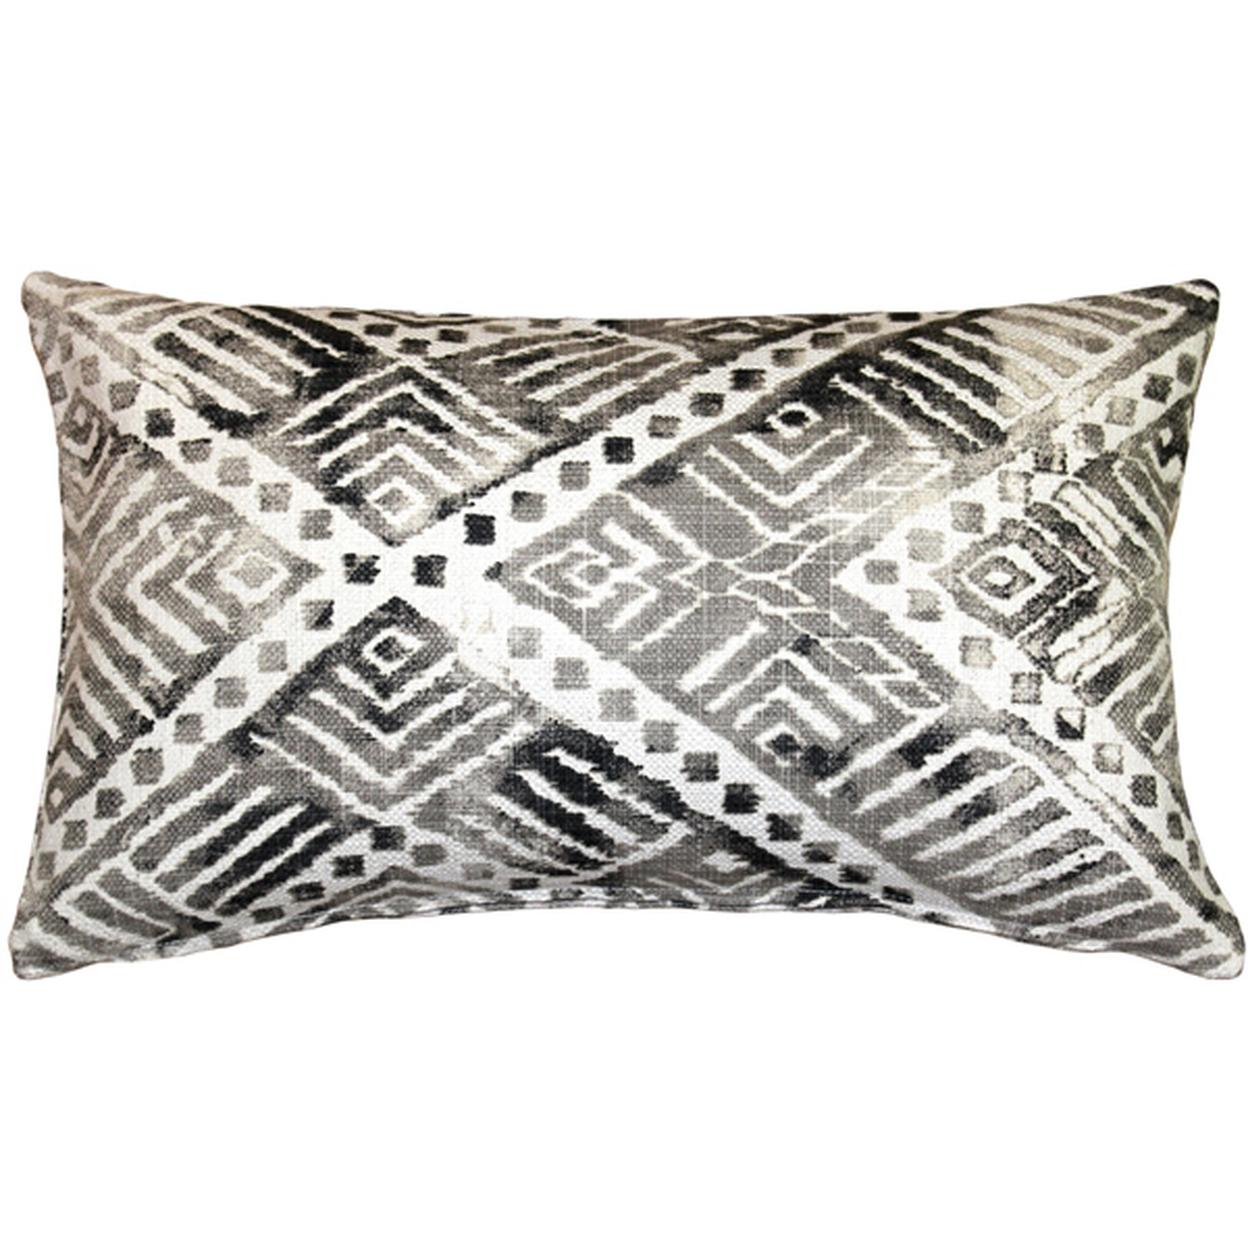 Compare Pillow Decor - Tangga Gray Throw Miscellaneous prices and Buy online - Shoppertom.com